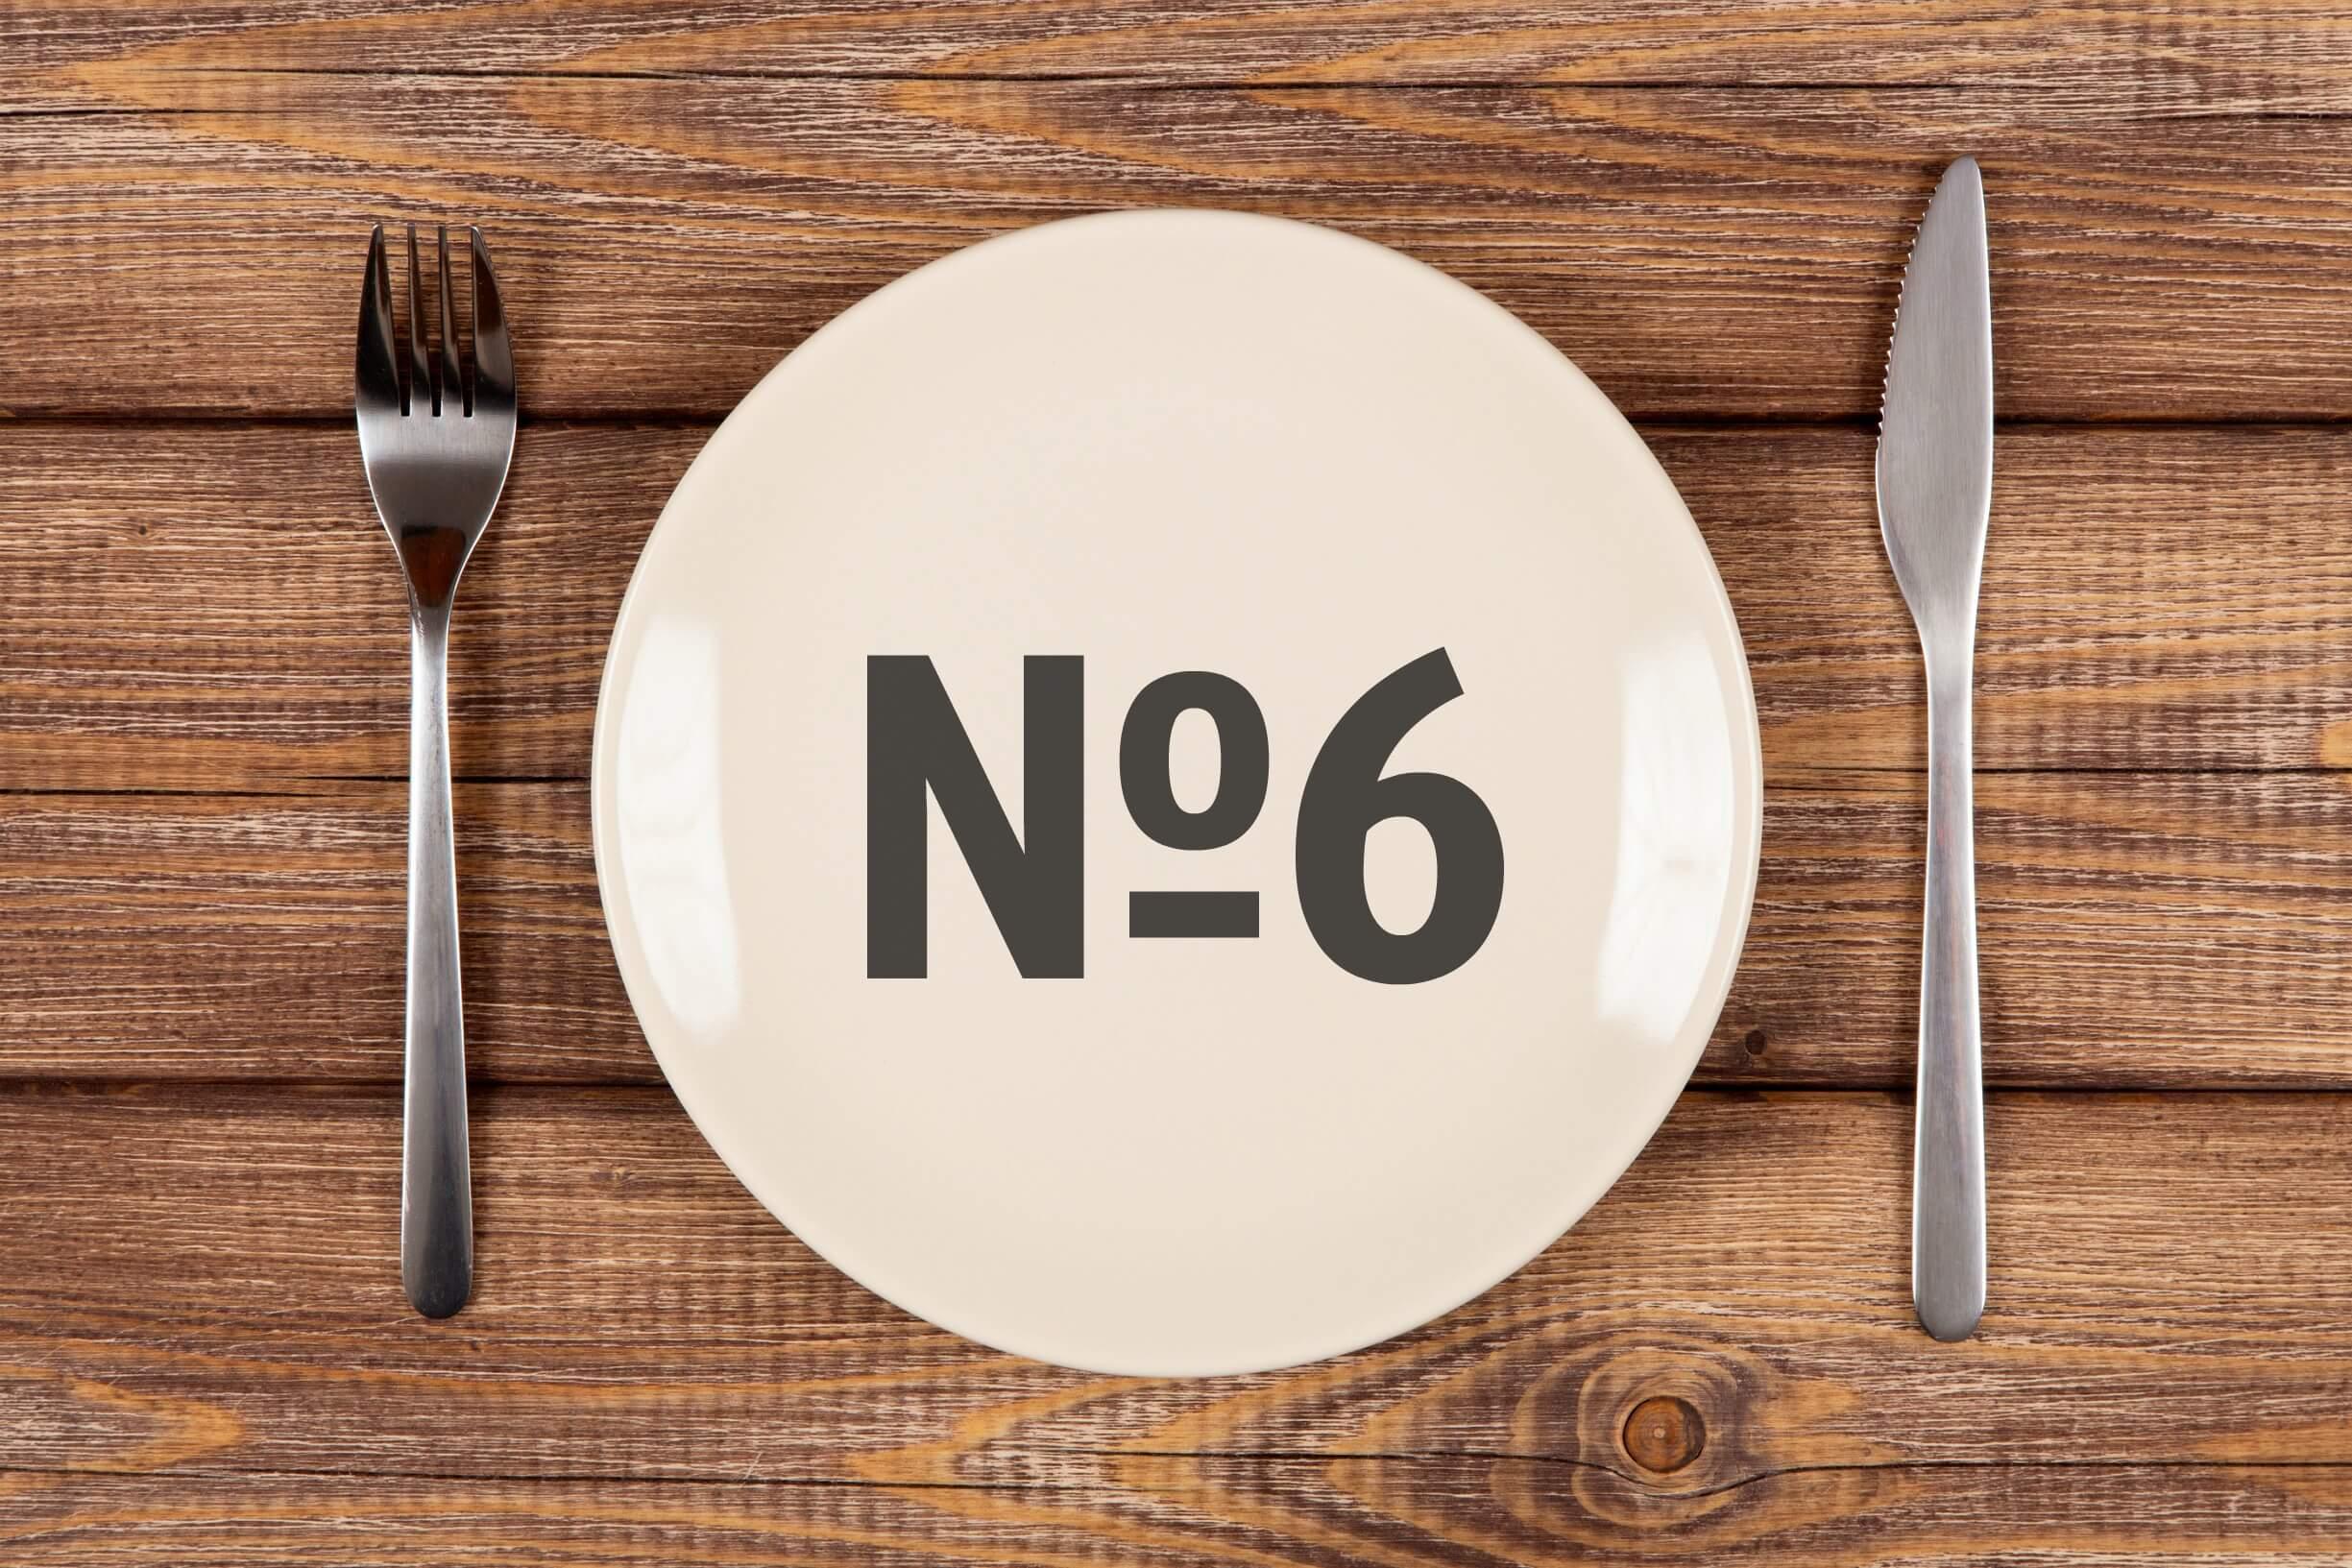 Лечебные диеты 15 столов презентация — pic 11